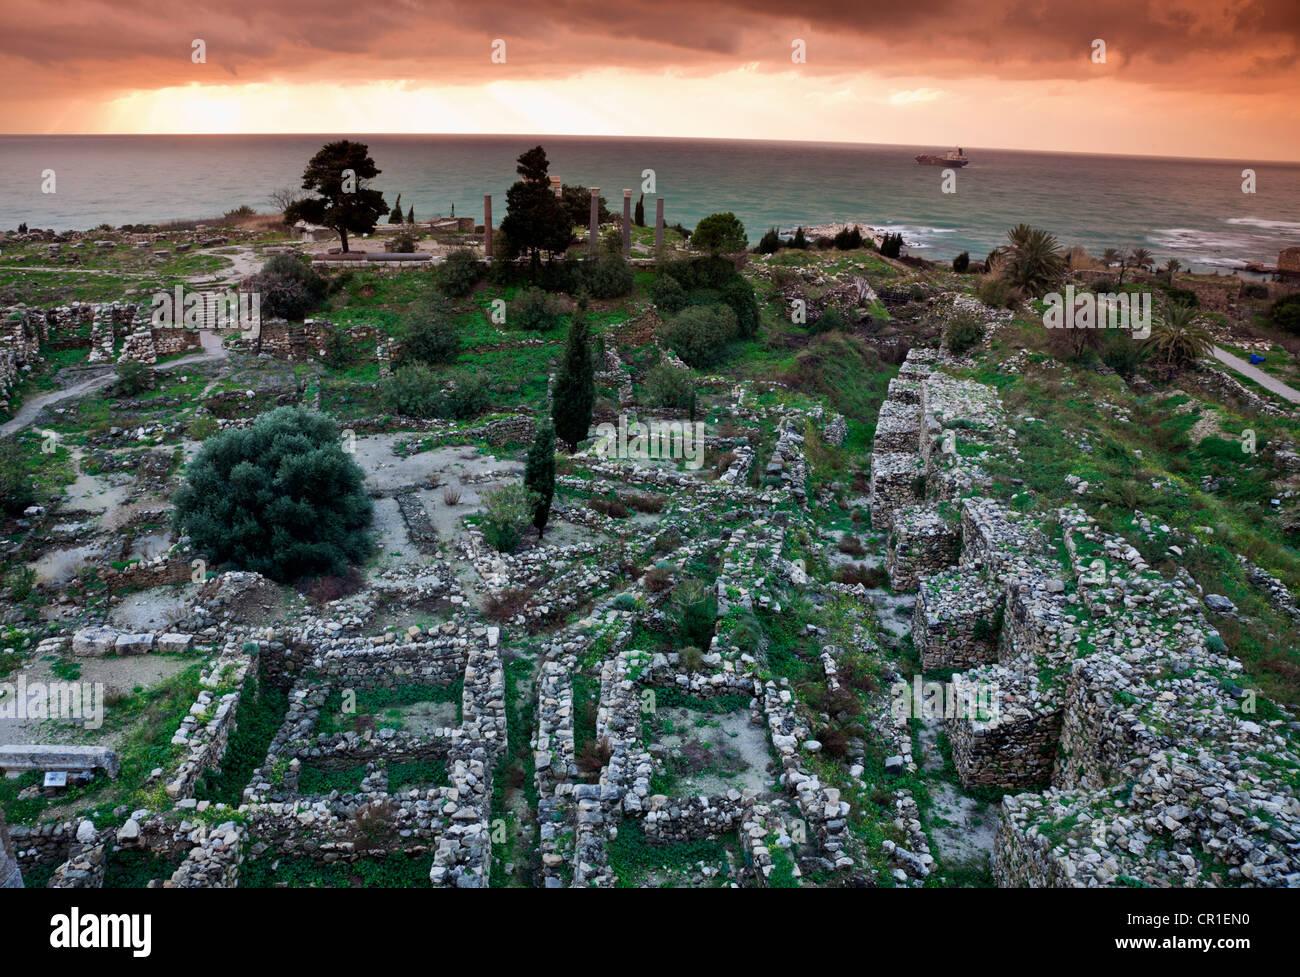 Lebanon, Byblos,  Ruins of ancient Greek city at sunset - Stock Image